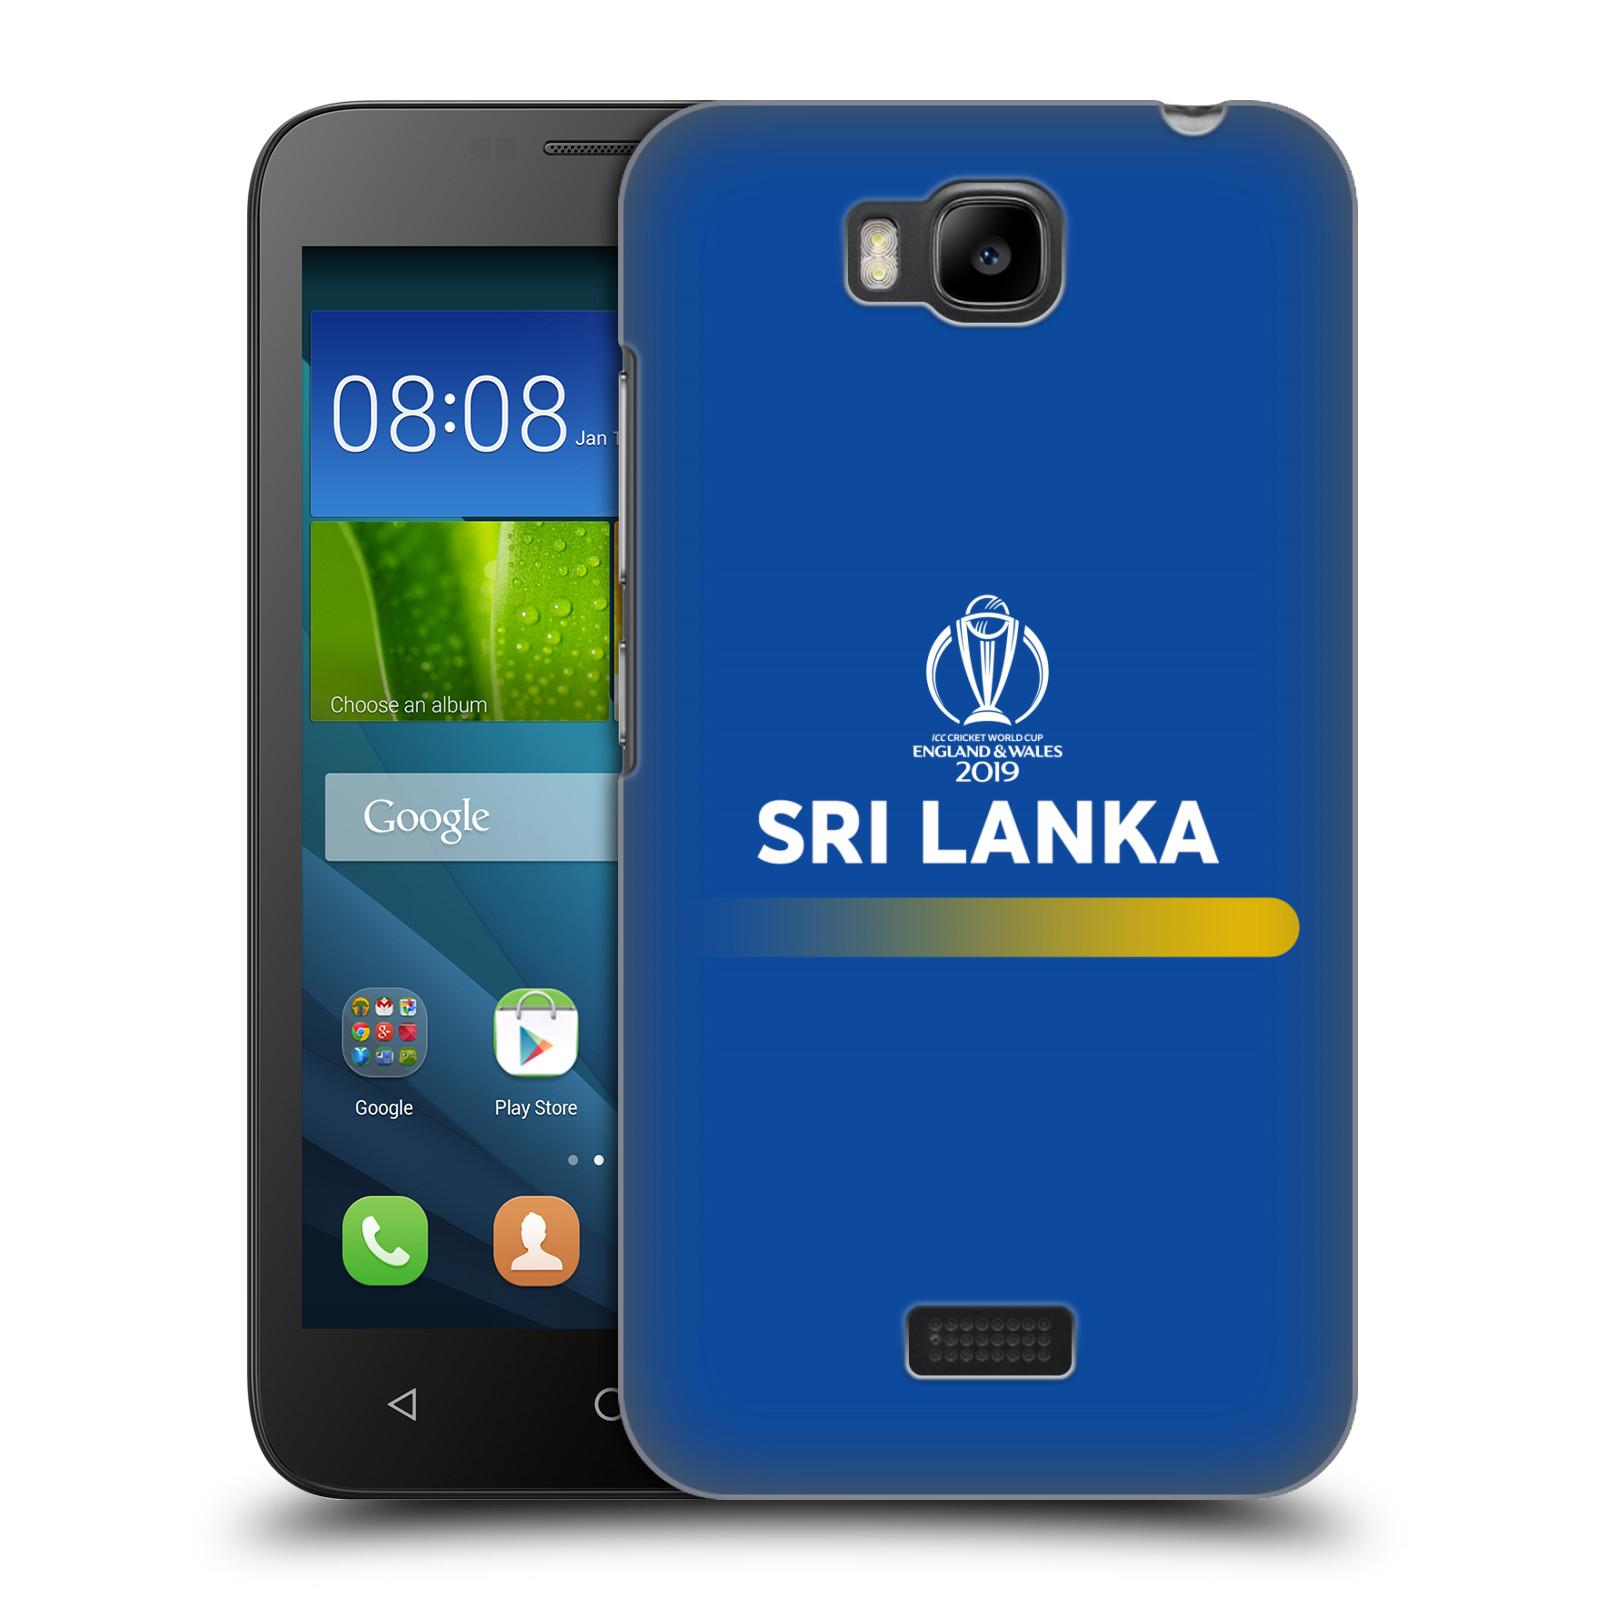 OFFICIAL-ICC-SRI-LANKA-HARD-BACK-CASE-FOR-HUAWEI-PHONES-2